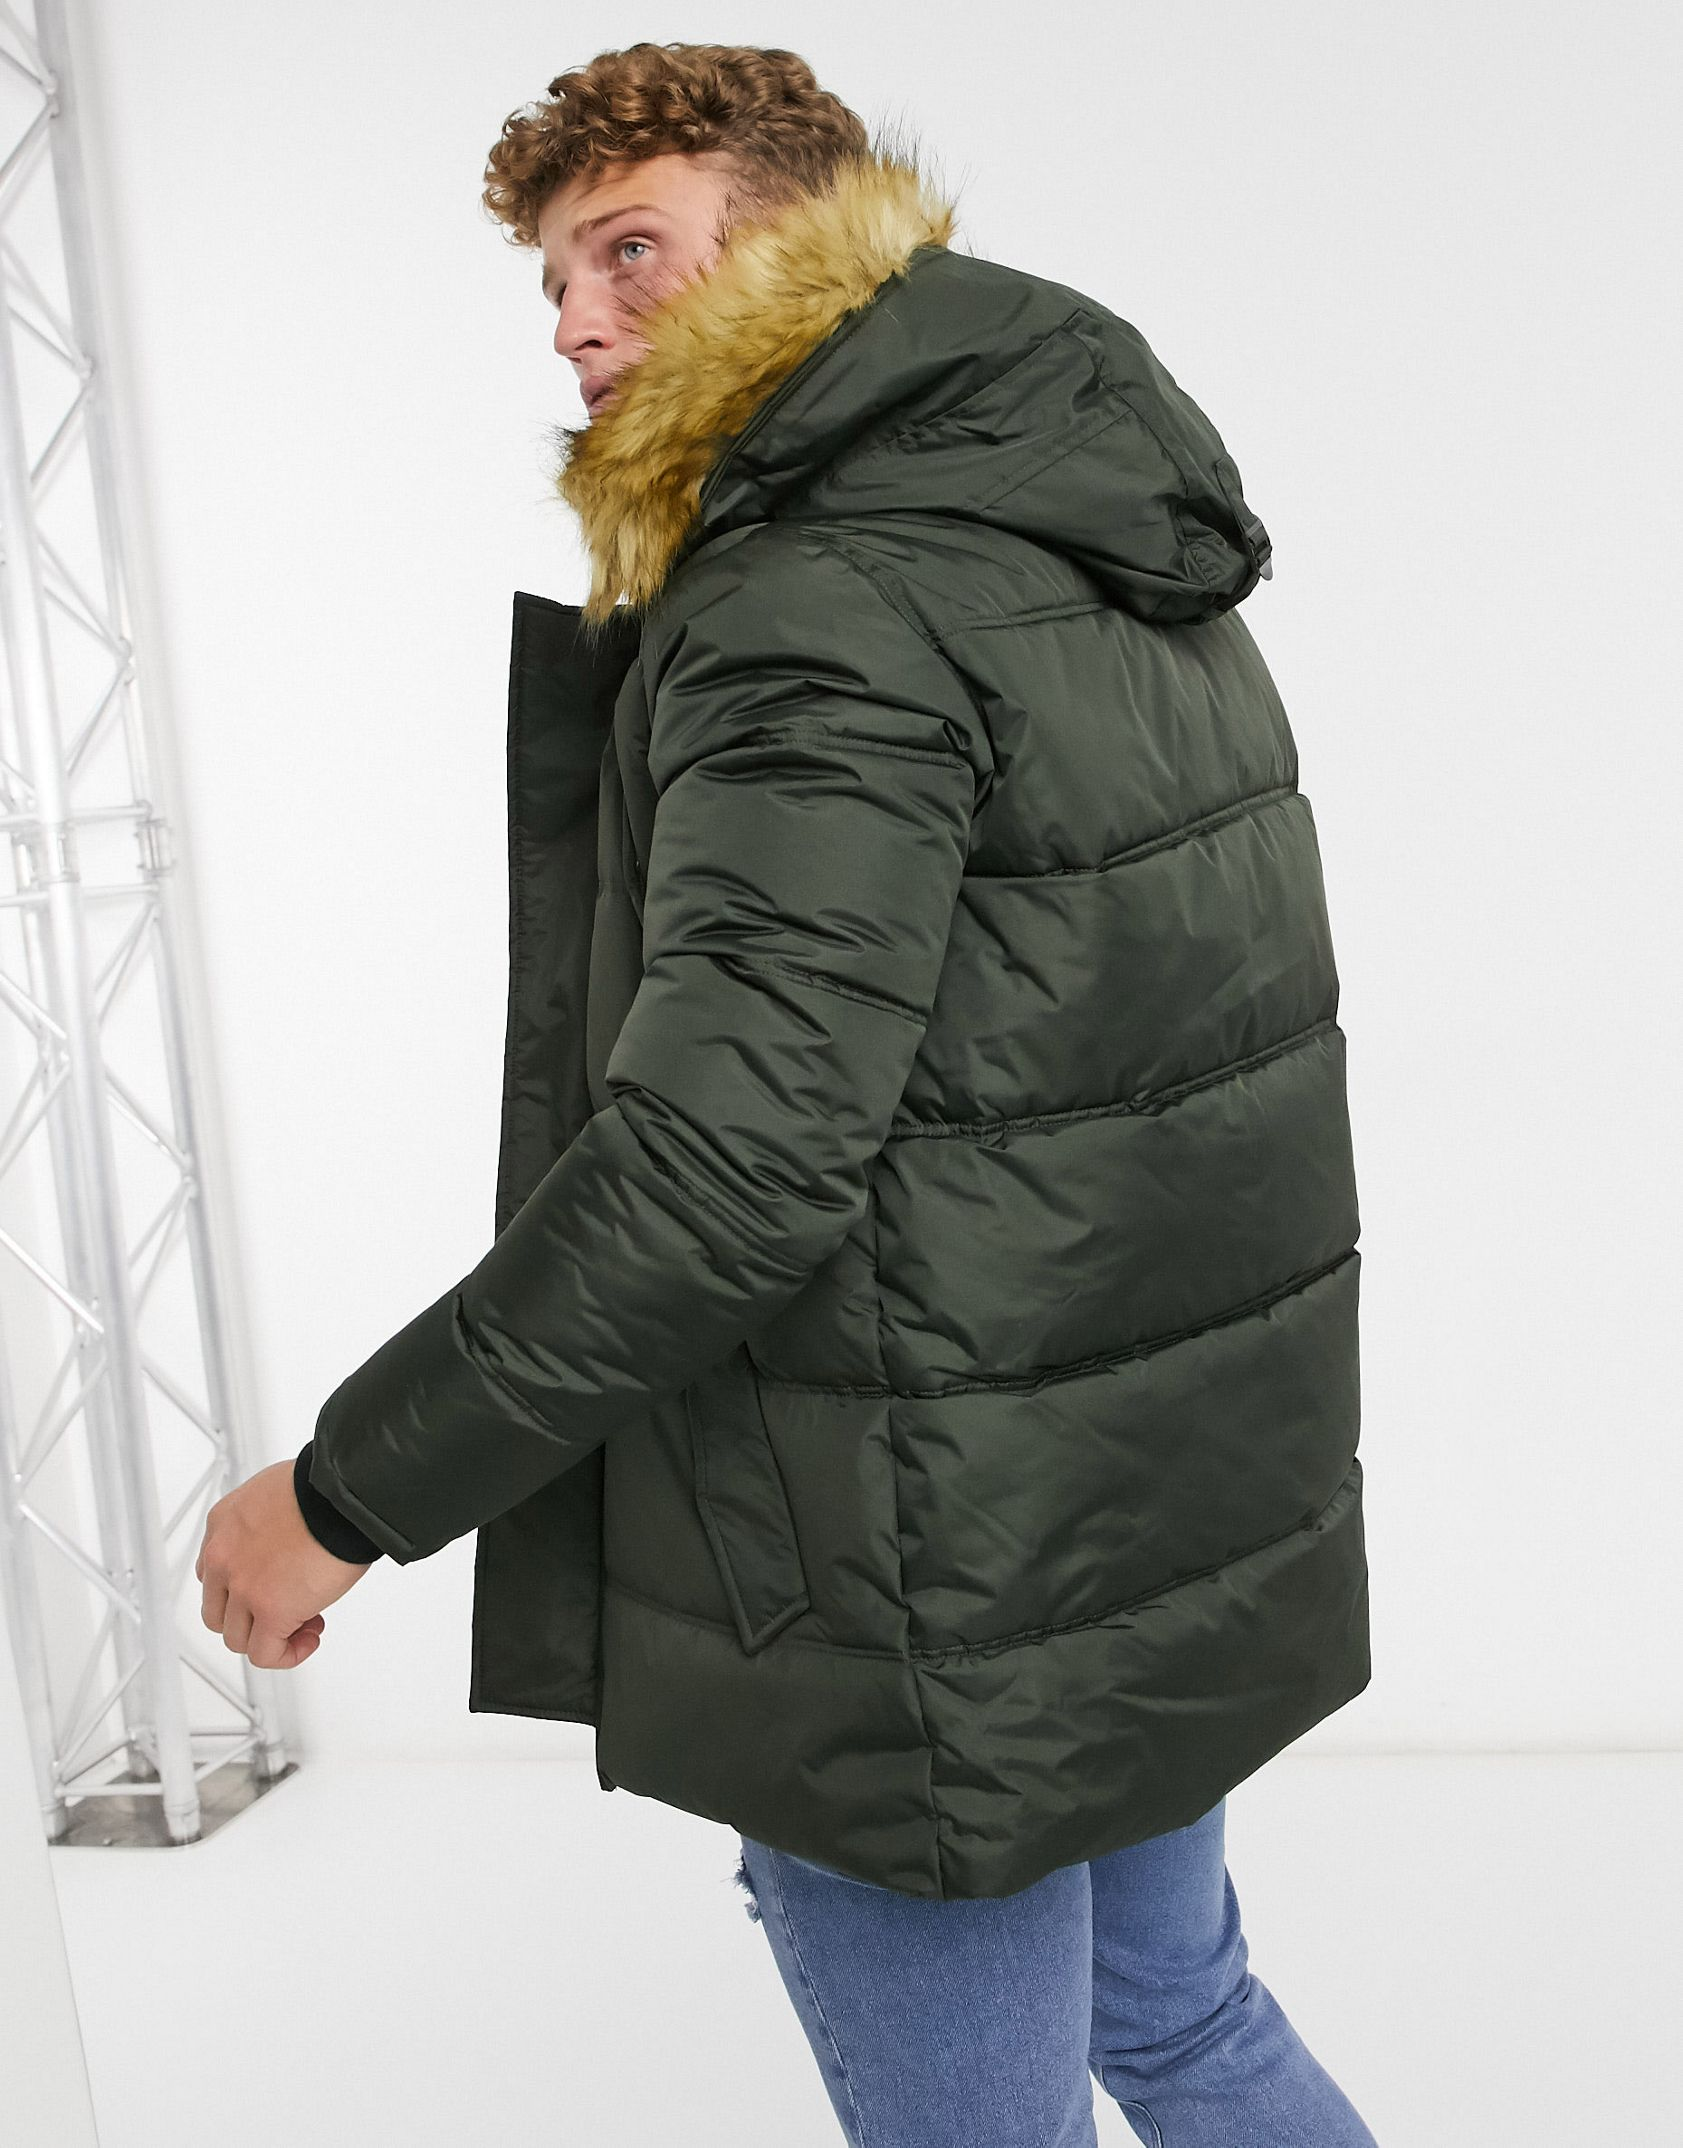 Schott Air hooded parka with detachable faux fur trim in khaki -  Price Checker